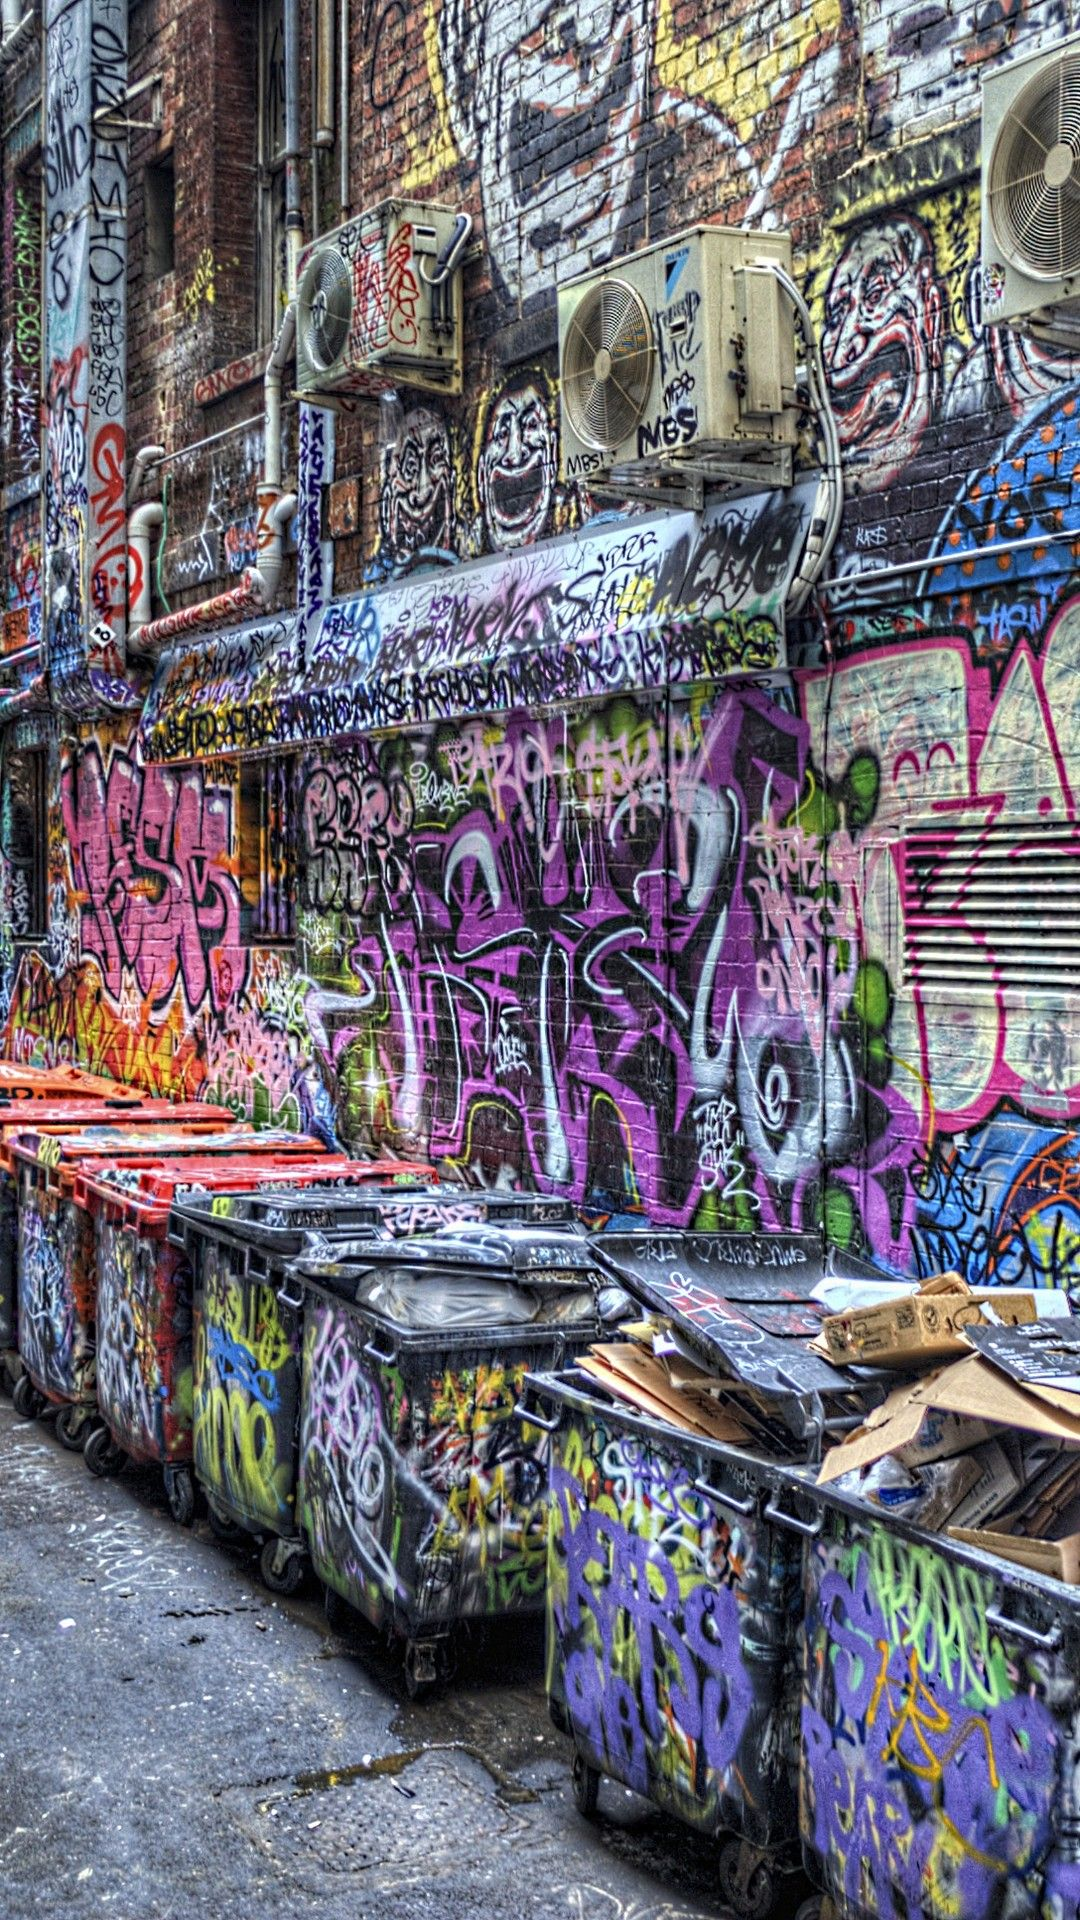 Graffiti Art Hd Wallpaper For Iphone Best Wallpaper Hd Street Art Graffiti Art Urban Art